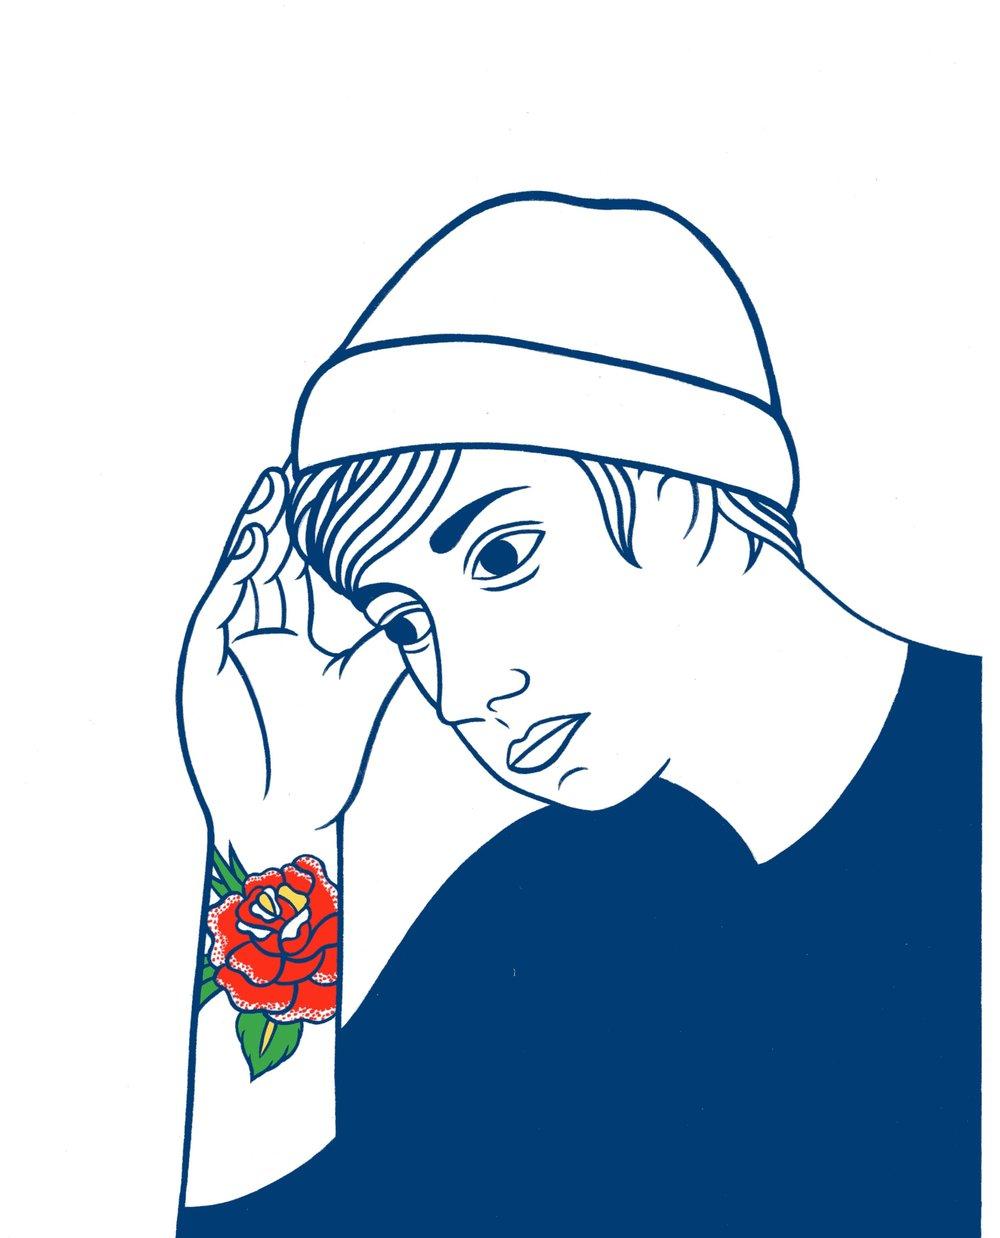 rose tattoos_02.jpg